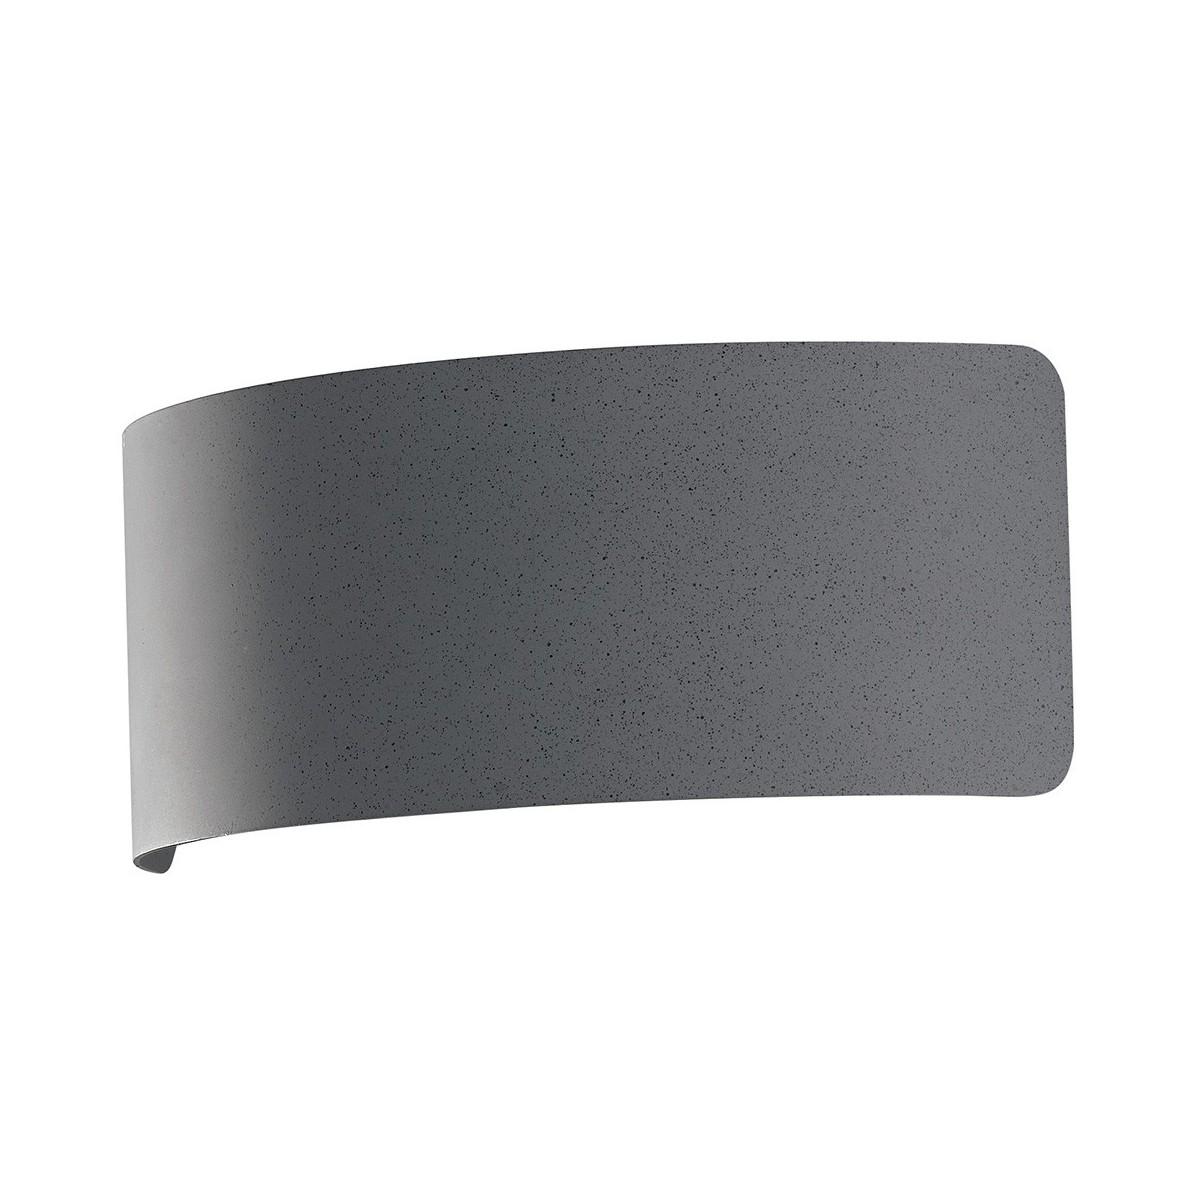 LED-DYNAMIC-AP32 GR - Applique Moderna Arcuata Metallo Finitura Grigio Pietra Led 8 watt Luce Naturale